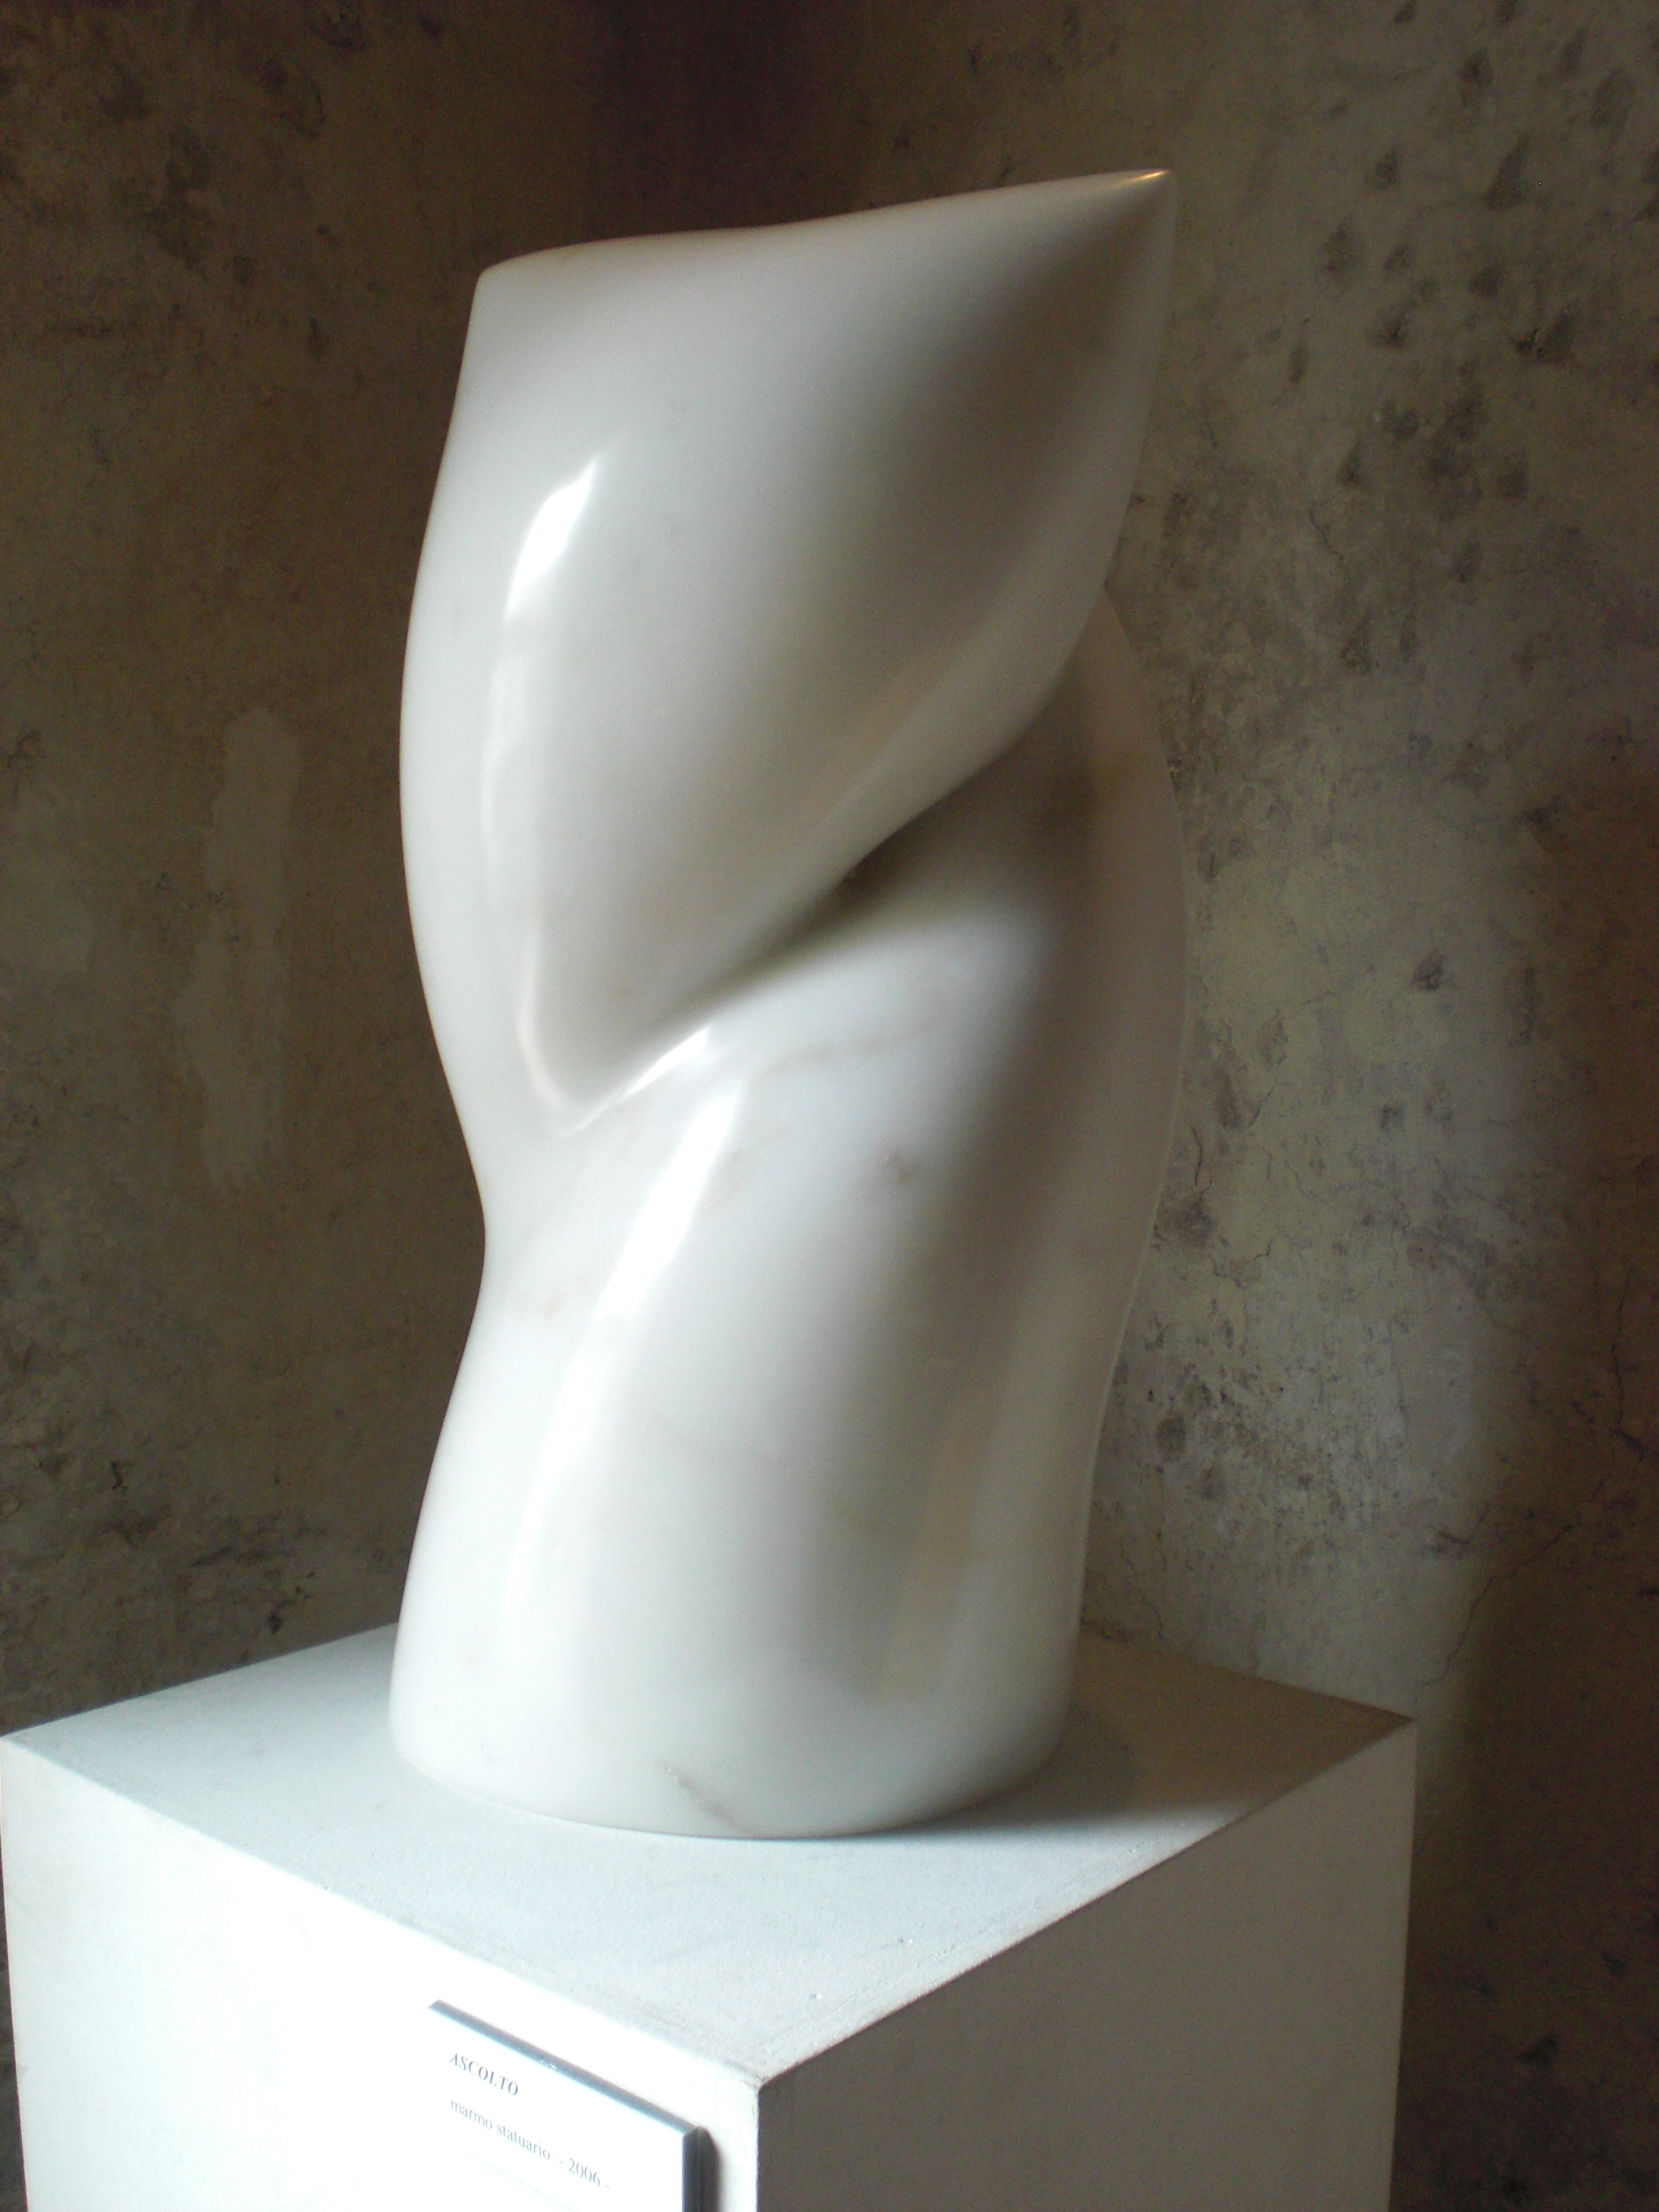 Ascolto - h 36 cm  statuario marble 2007